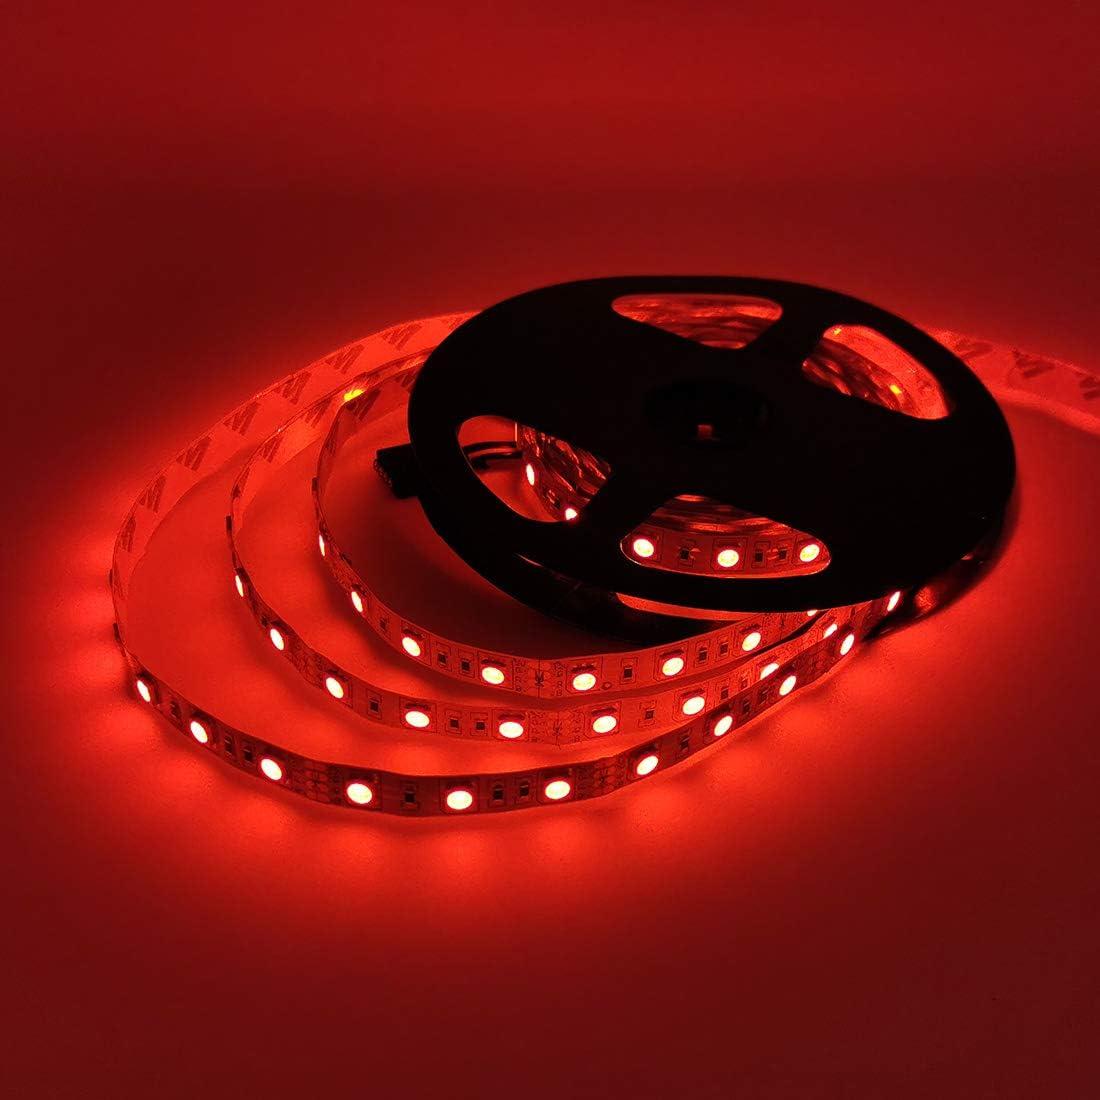 JOYLAND 12V Flexible RGB LED Strip Lights 300 Units 5050 LEDs Non-waterproof LED Tape Multi-colors LED Strips Light Pack of 16.4ft//5m